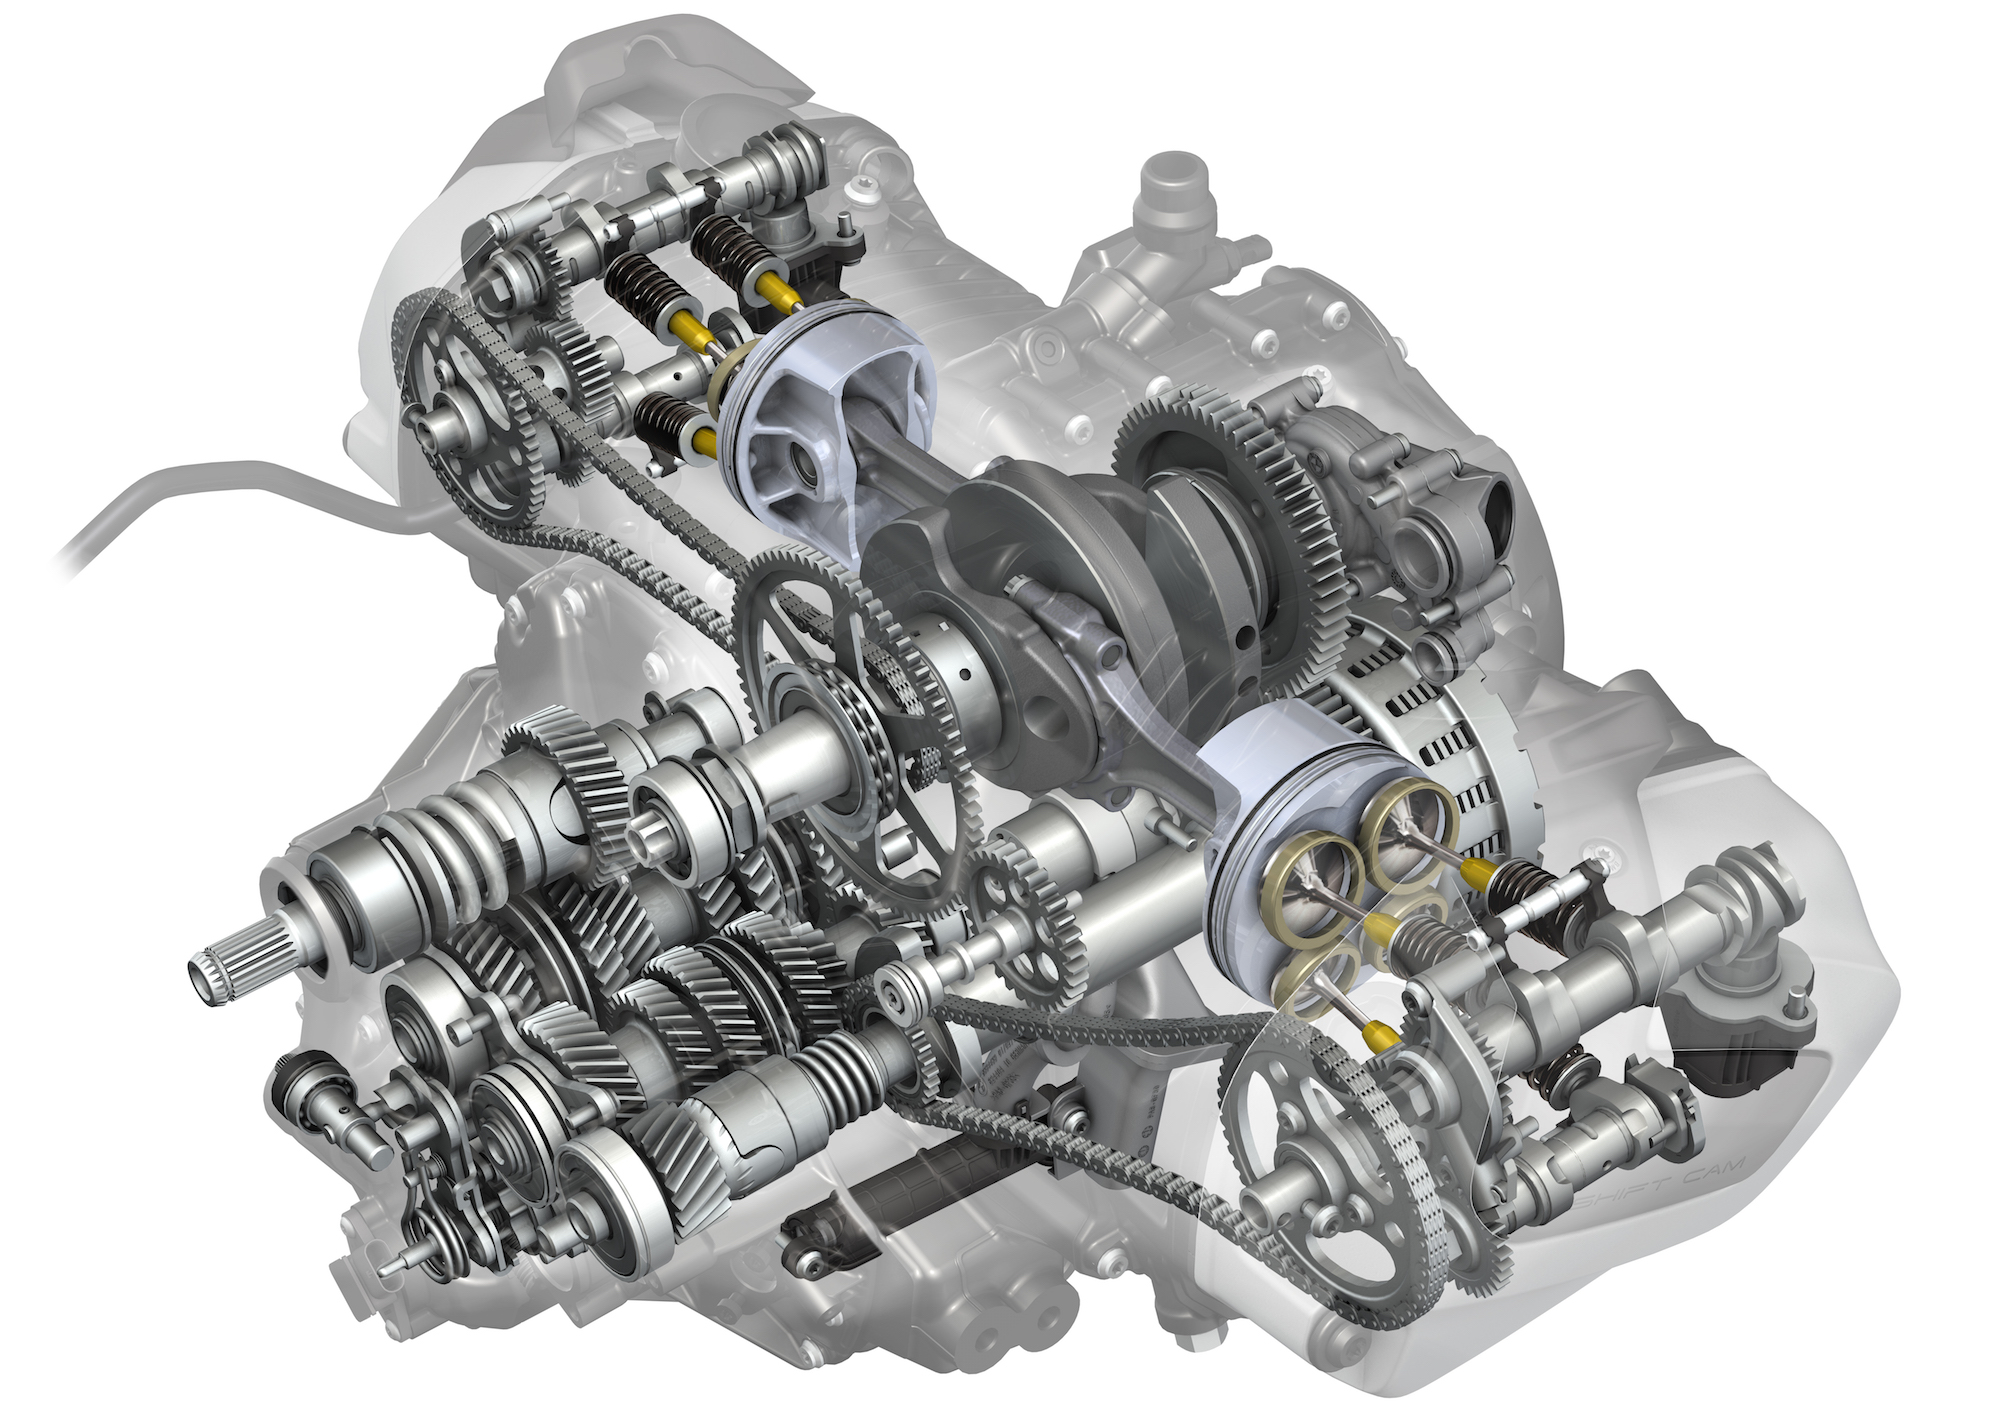 2019 R1250 GS ShiftCam engine